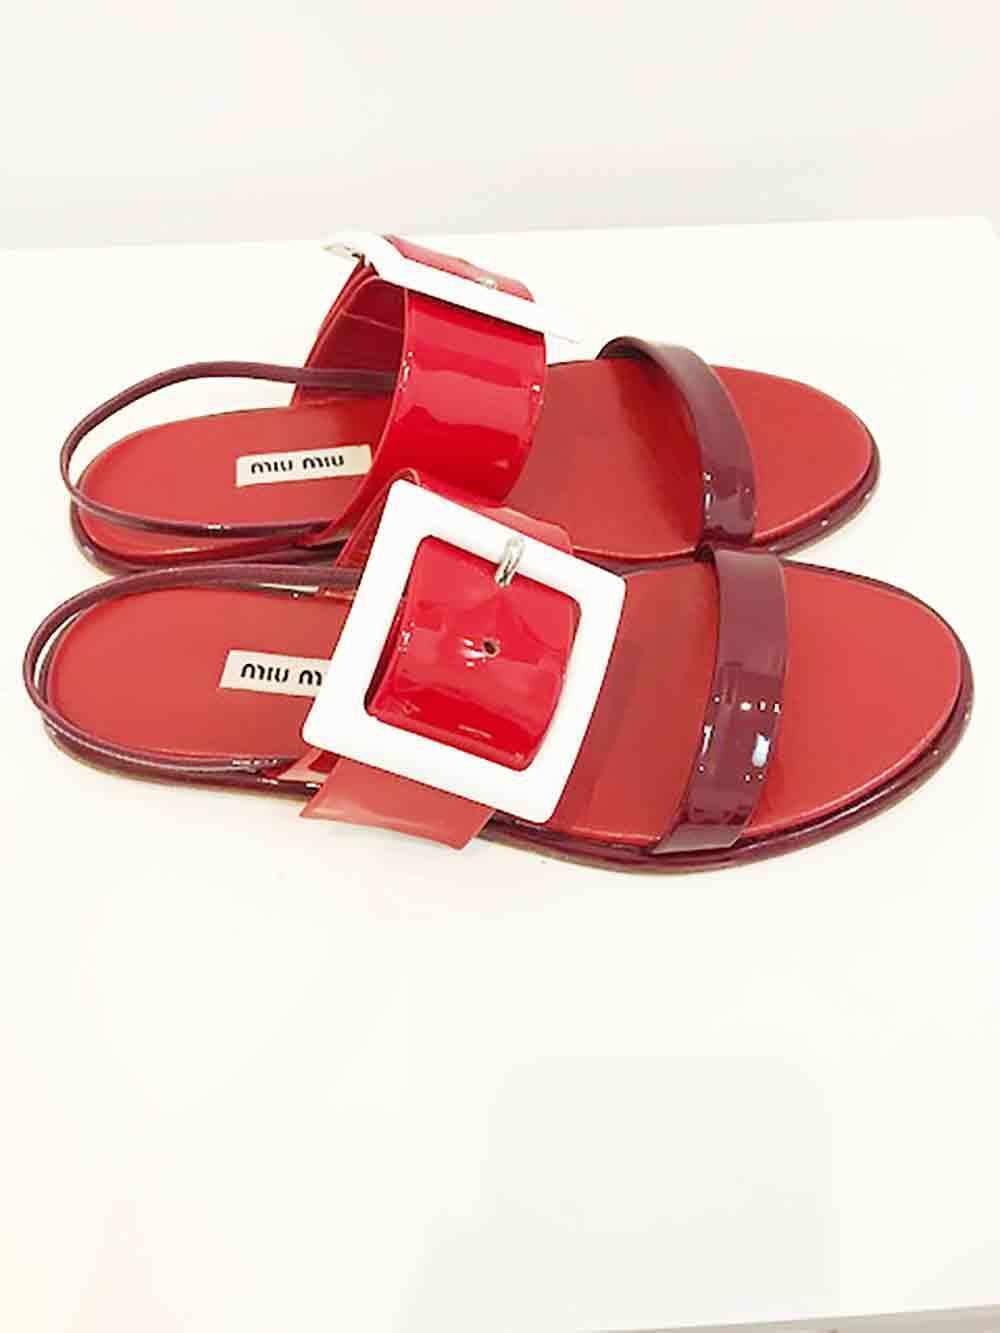 Designer BNWB MIU MIU Size 39.5 Stunning Red Leather Women's Sandals